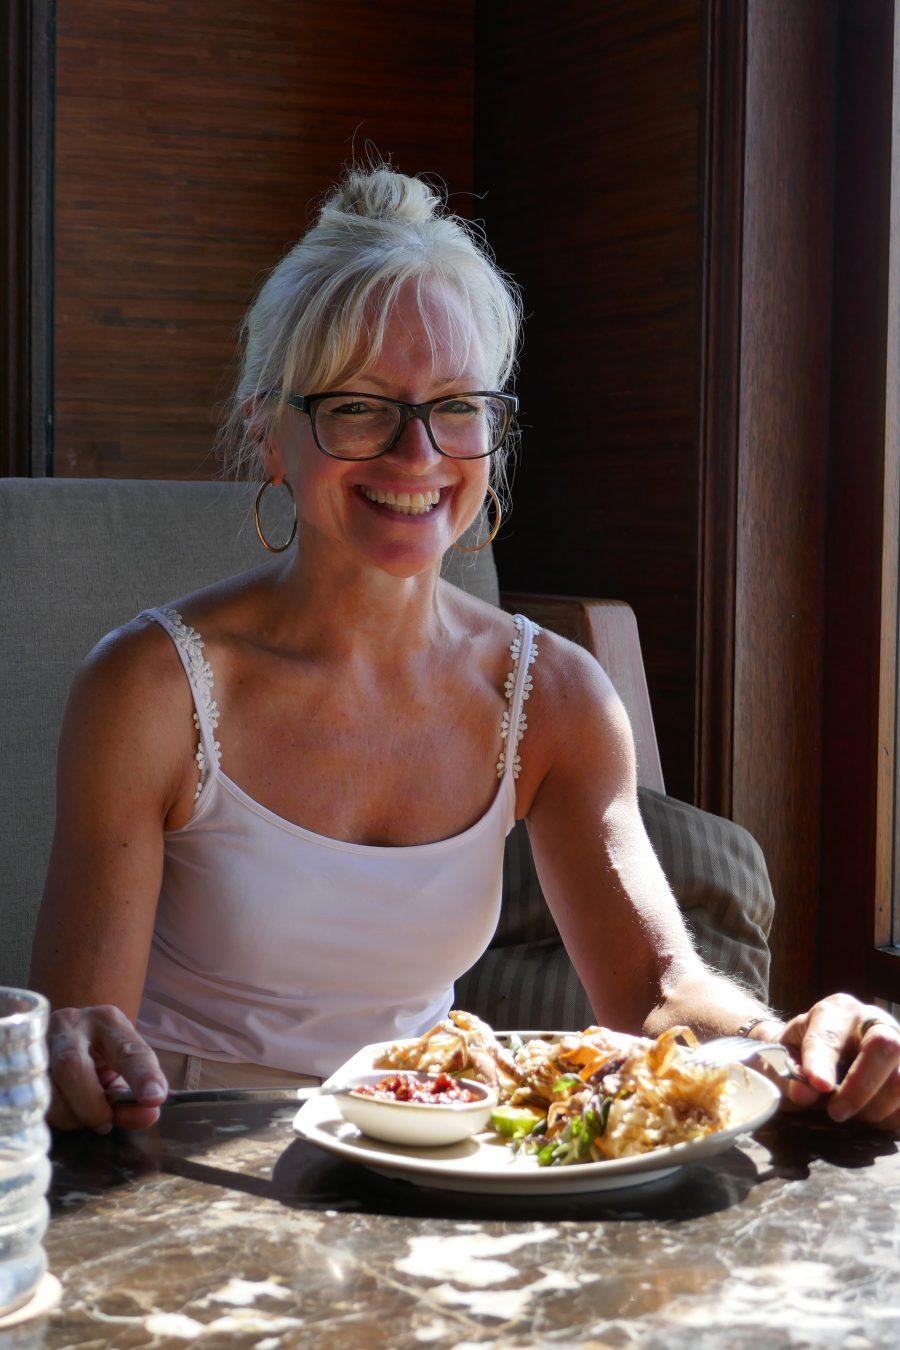 Corinna Kretschmar-Joehnk on her trip to Bali